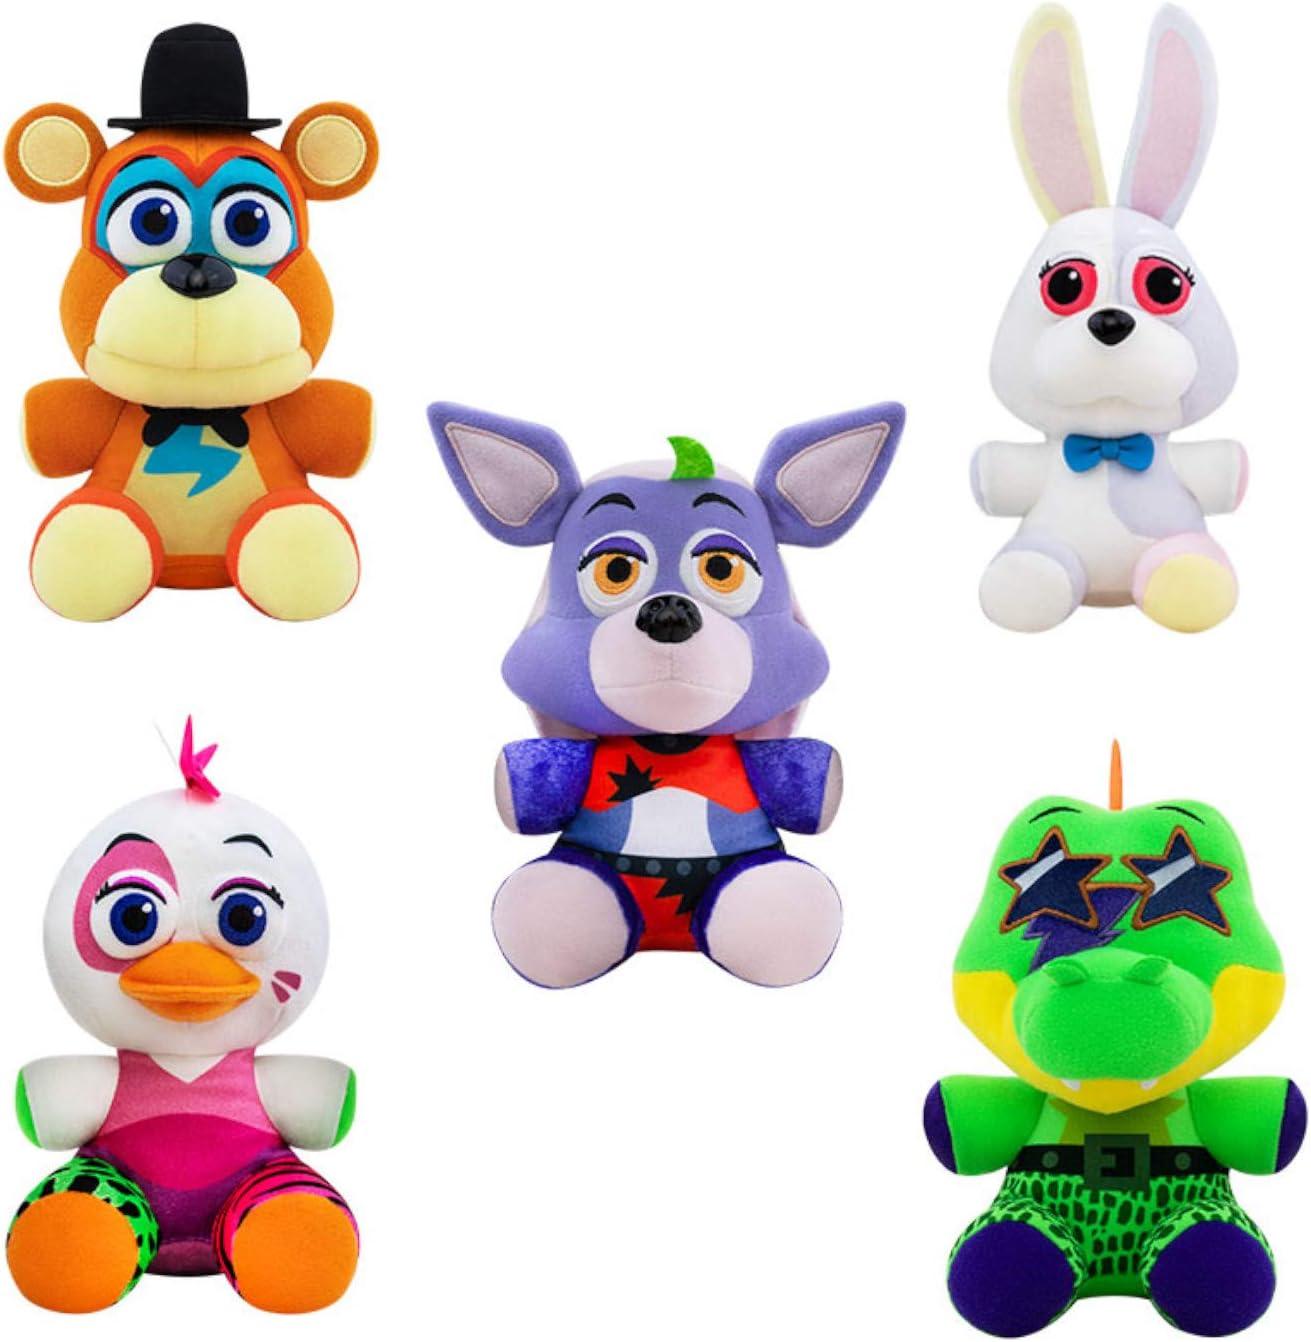 Koala Stuffed Animals Mini, Amazon Com Funko Plush Five Nights At Freddy S Security Breach Set Of 5 Vannie Glamrock Freddy Glamrock Chica Montgomery Gator Roxanne Wolf Fnaf 6 Plush Bundle Toys Games